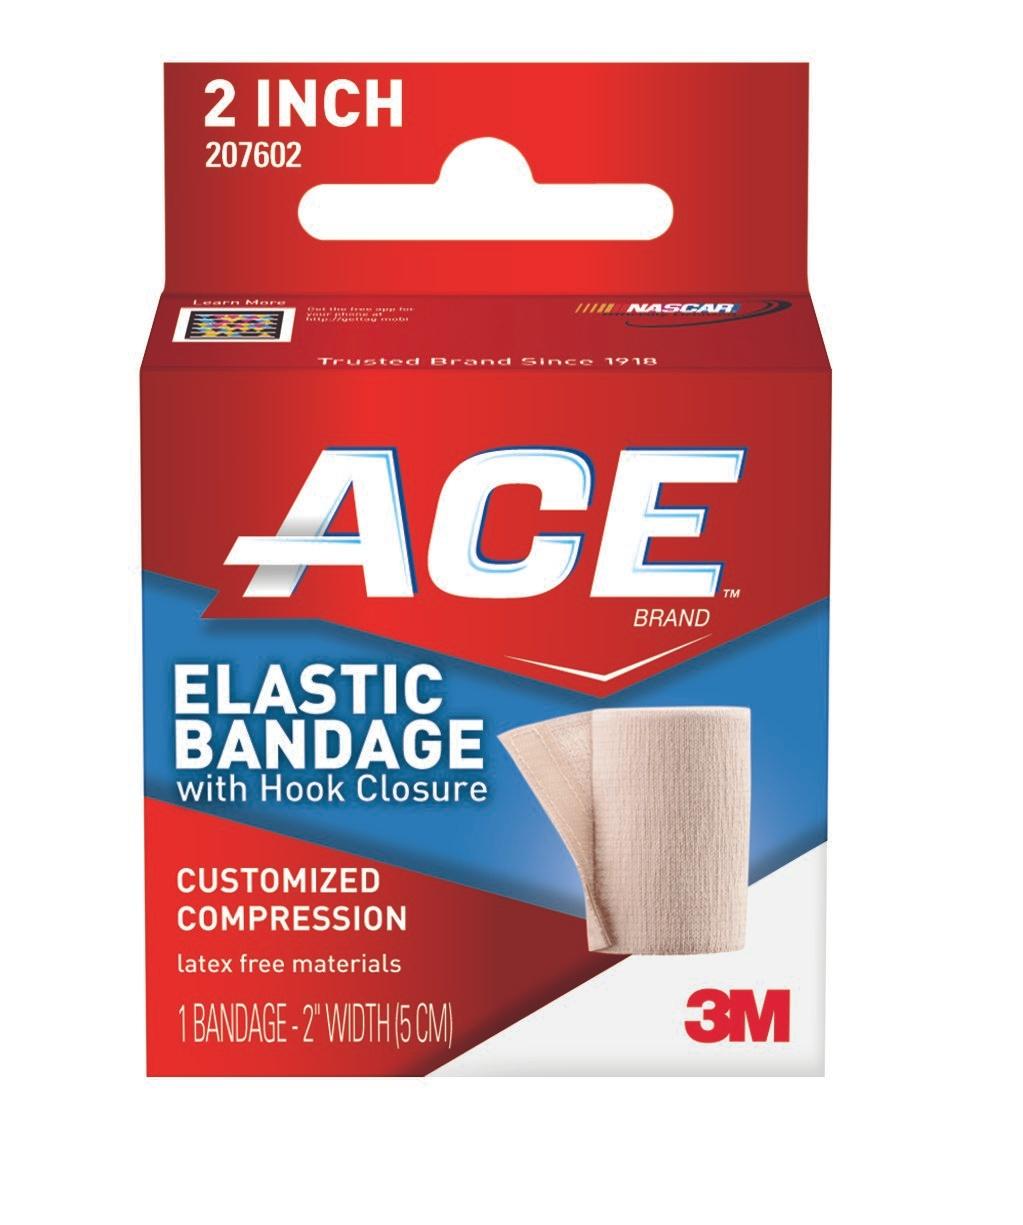 "3M ACE Elastic Bandage with Hook Closure, 2"" X 4.2', 207602, 1 Each"